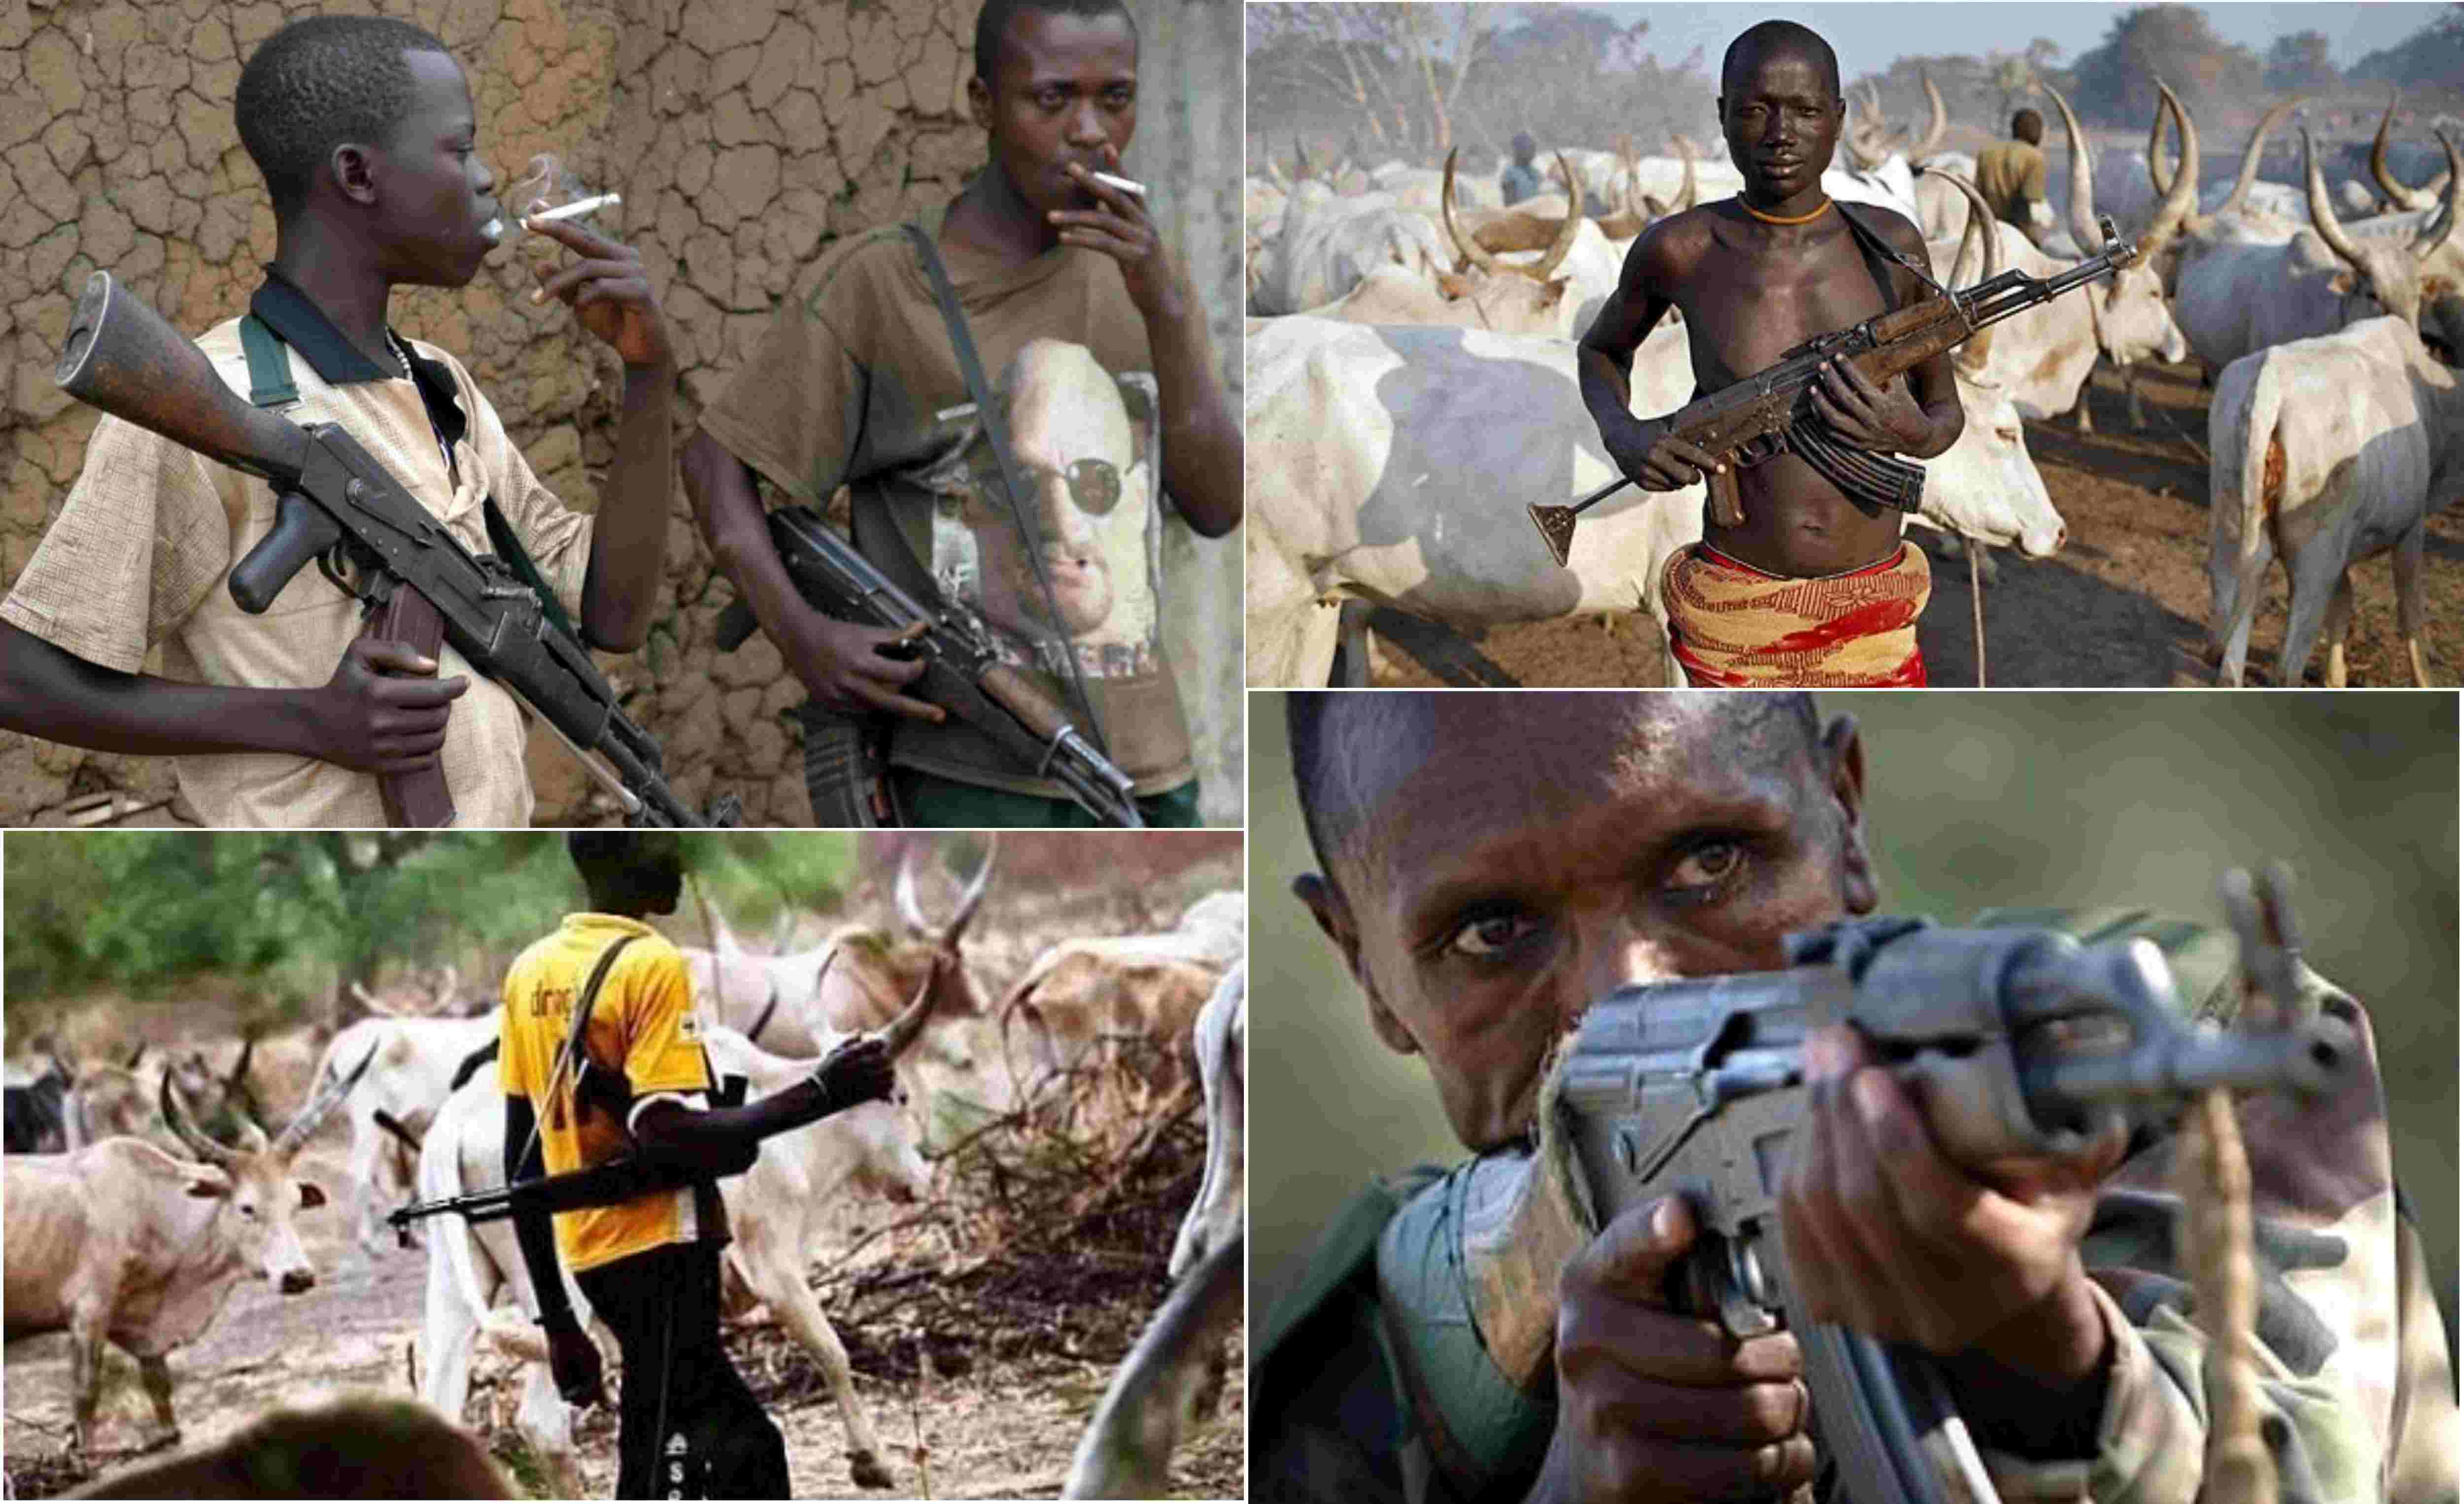 Fulani Herdsmen Armed With AK-47